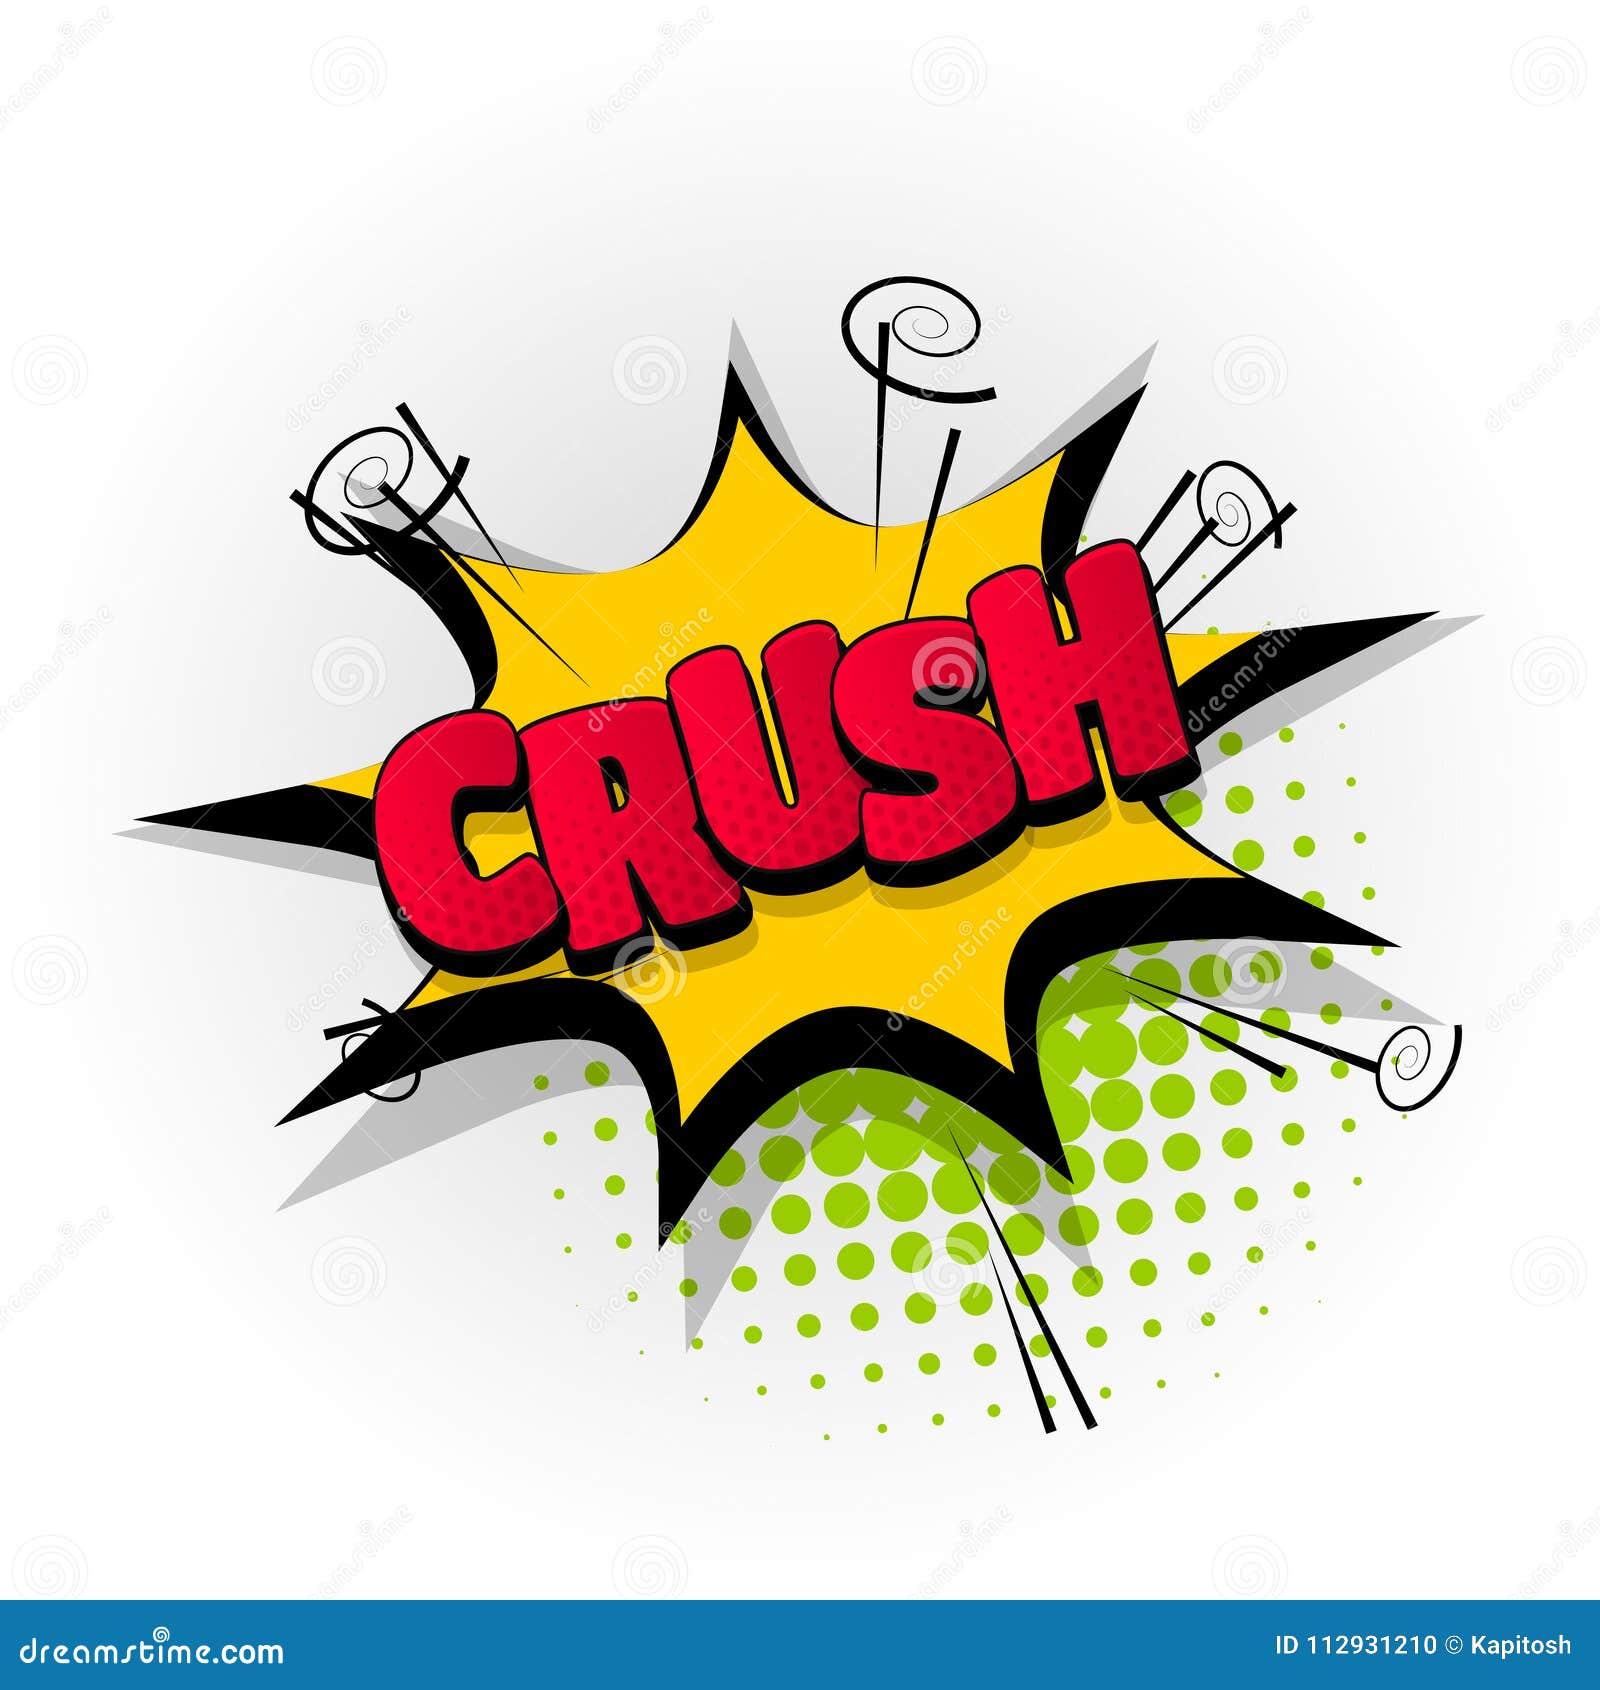 Crush crash comic book text pop art